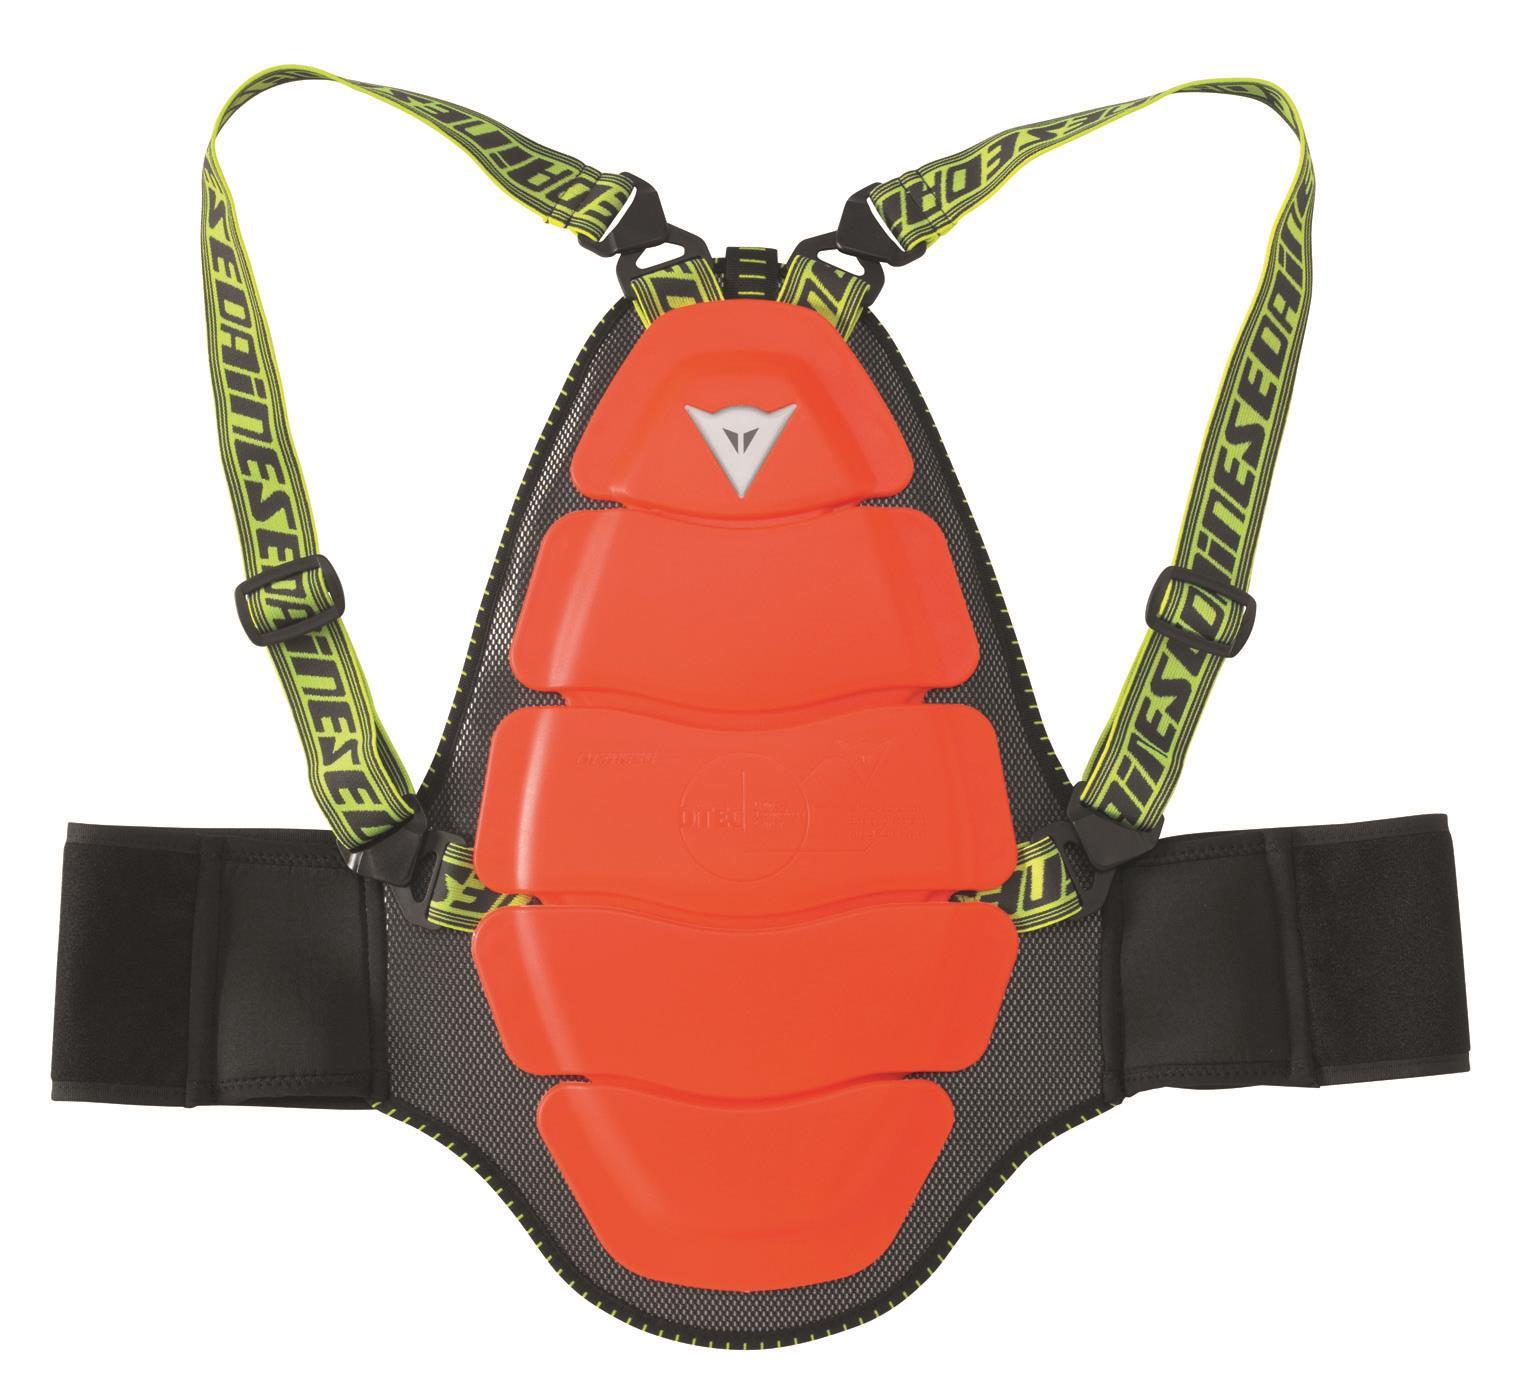 Dainese Защита спины детская  Back Protector 02 Evo, размер 44-46